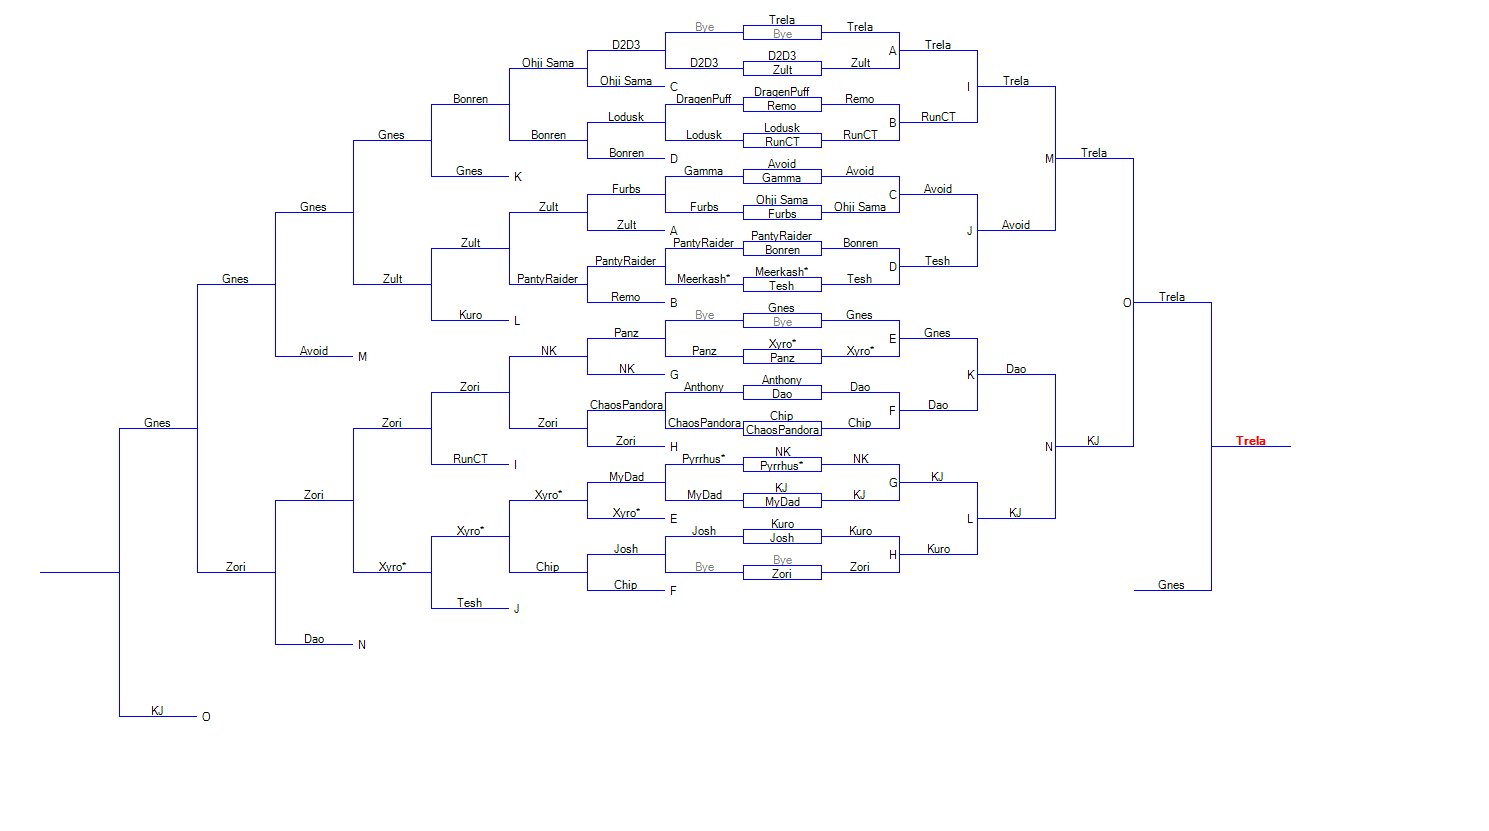 Smash WiiU 1vs1 @ Dragon's Den (29 entrants)